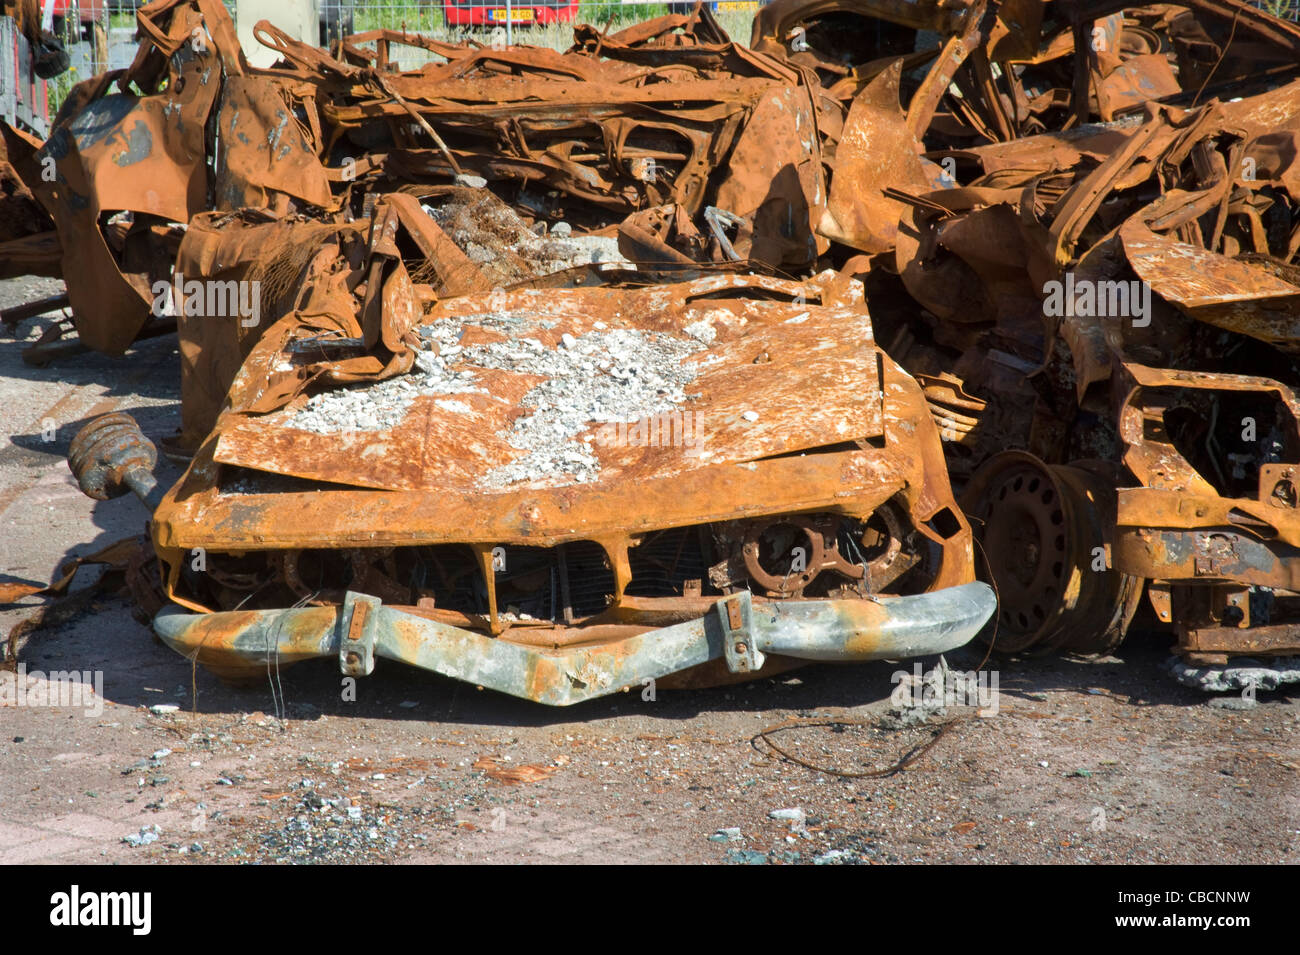 Burned dowm BMW, Noord Holland Amsterdam, fire, rusty - Stock Image